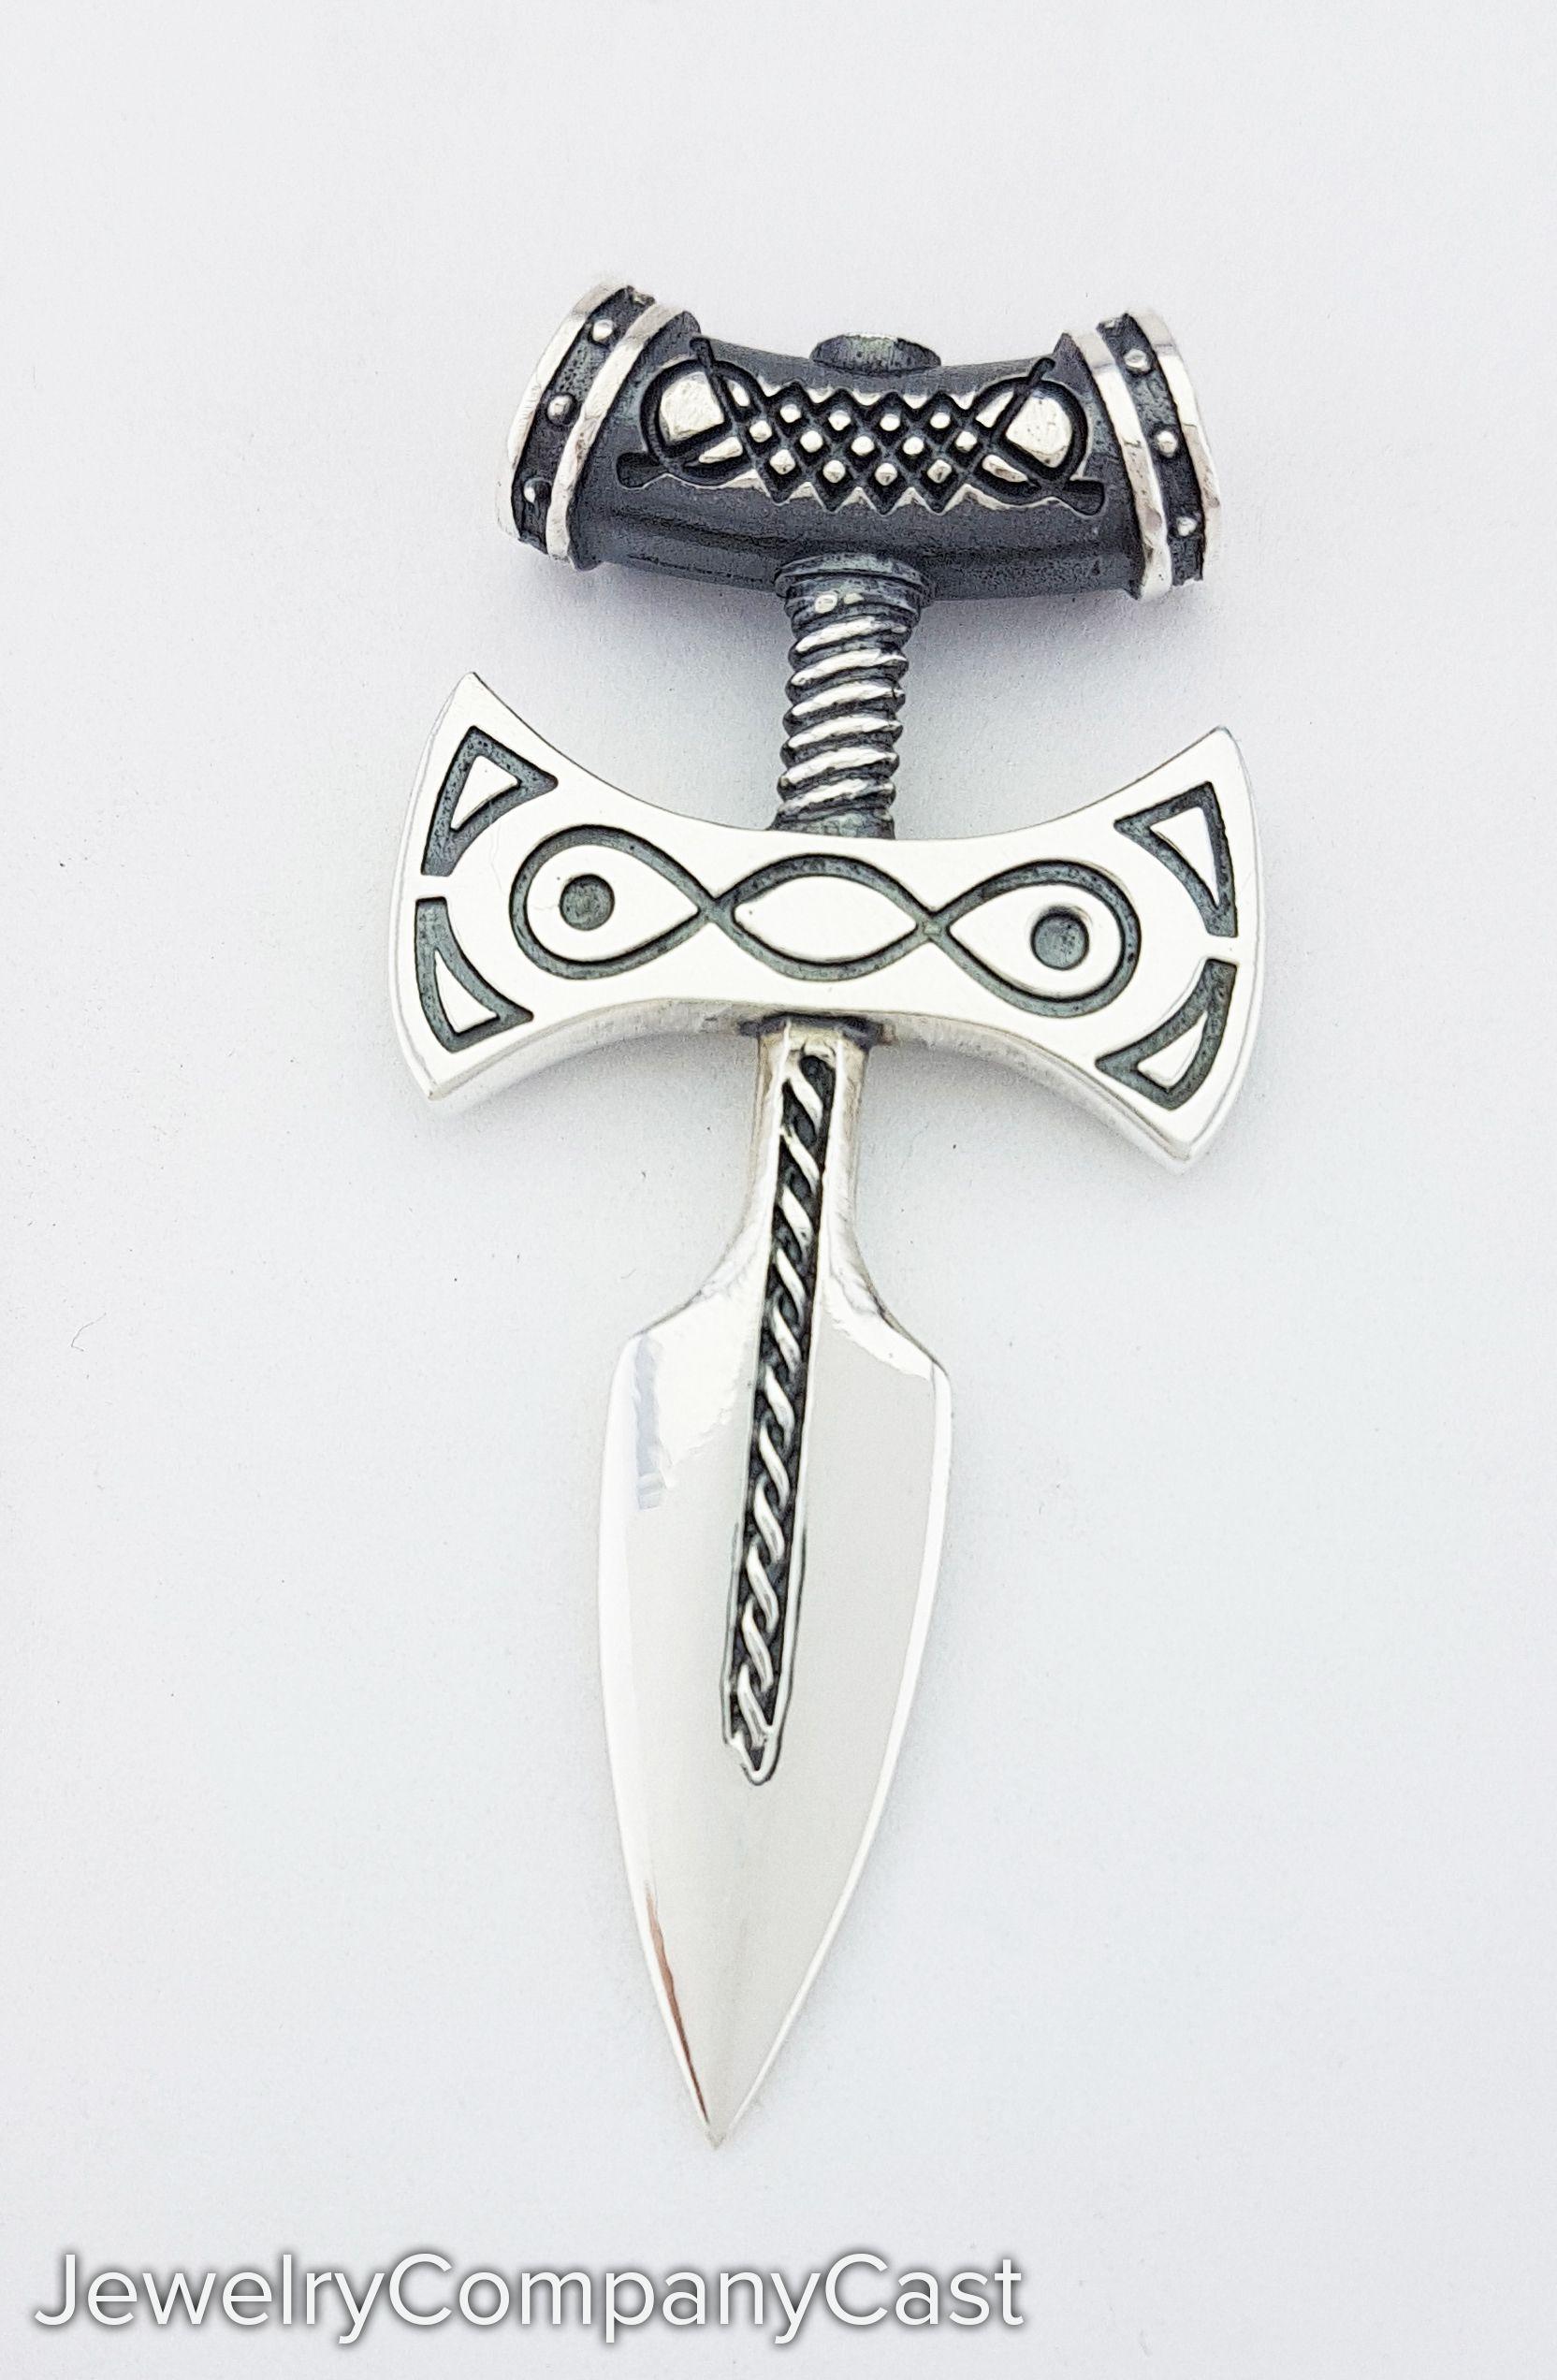 Amulet Of Talos amulet of talos silver 925 pendant, dovakin amulets 925